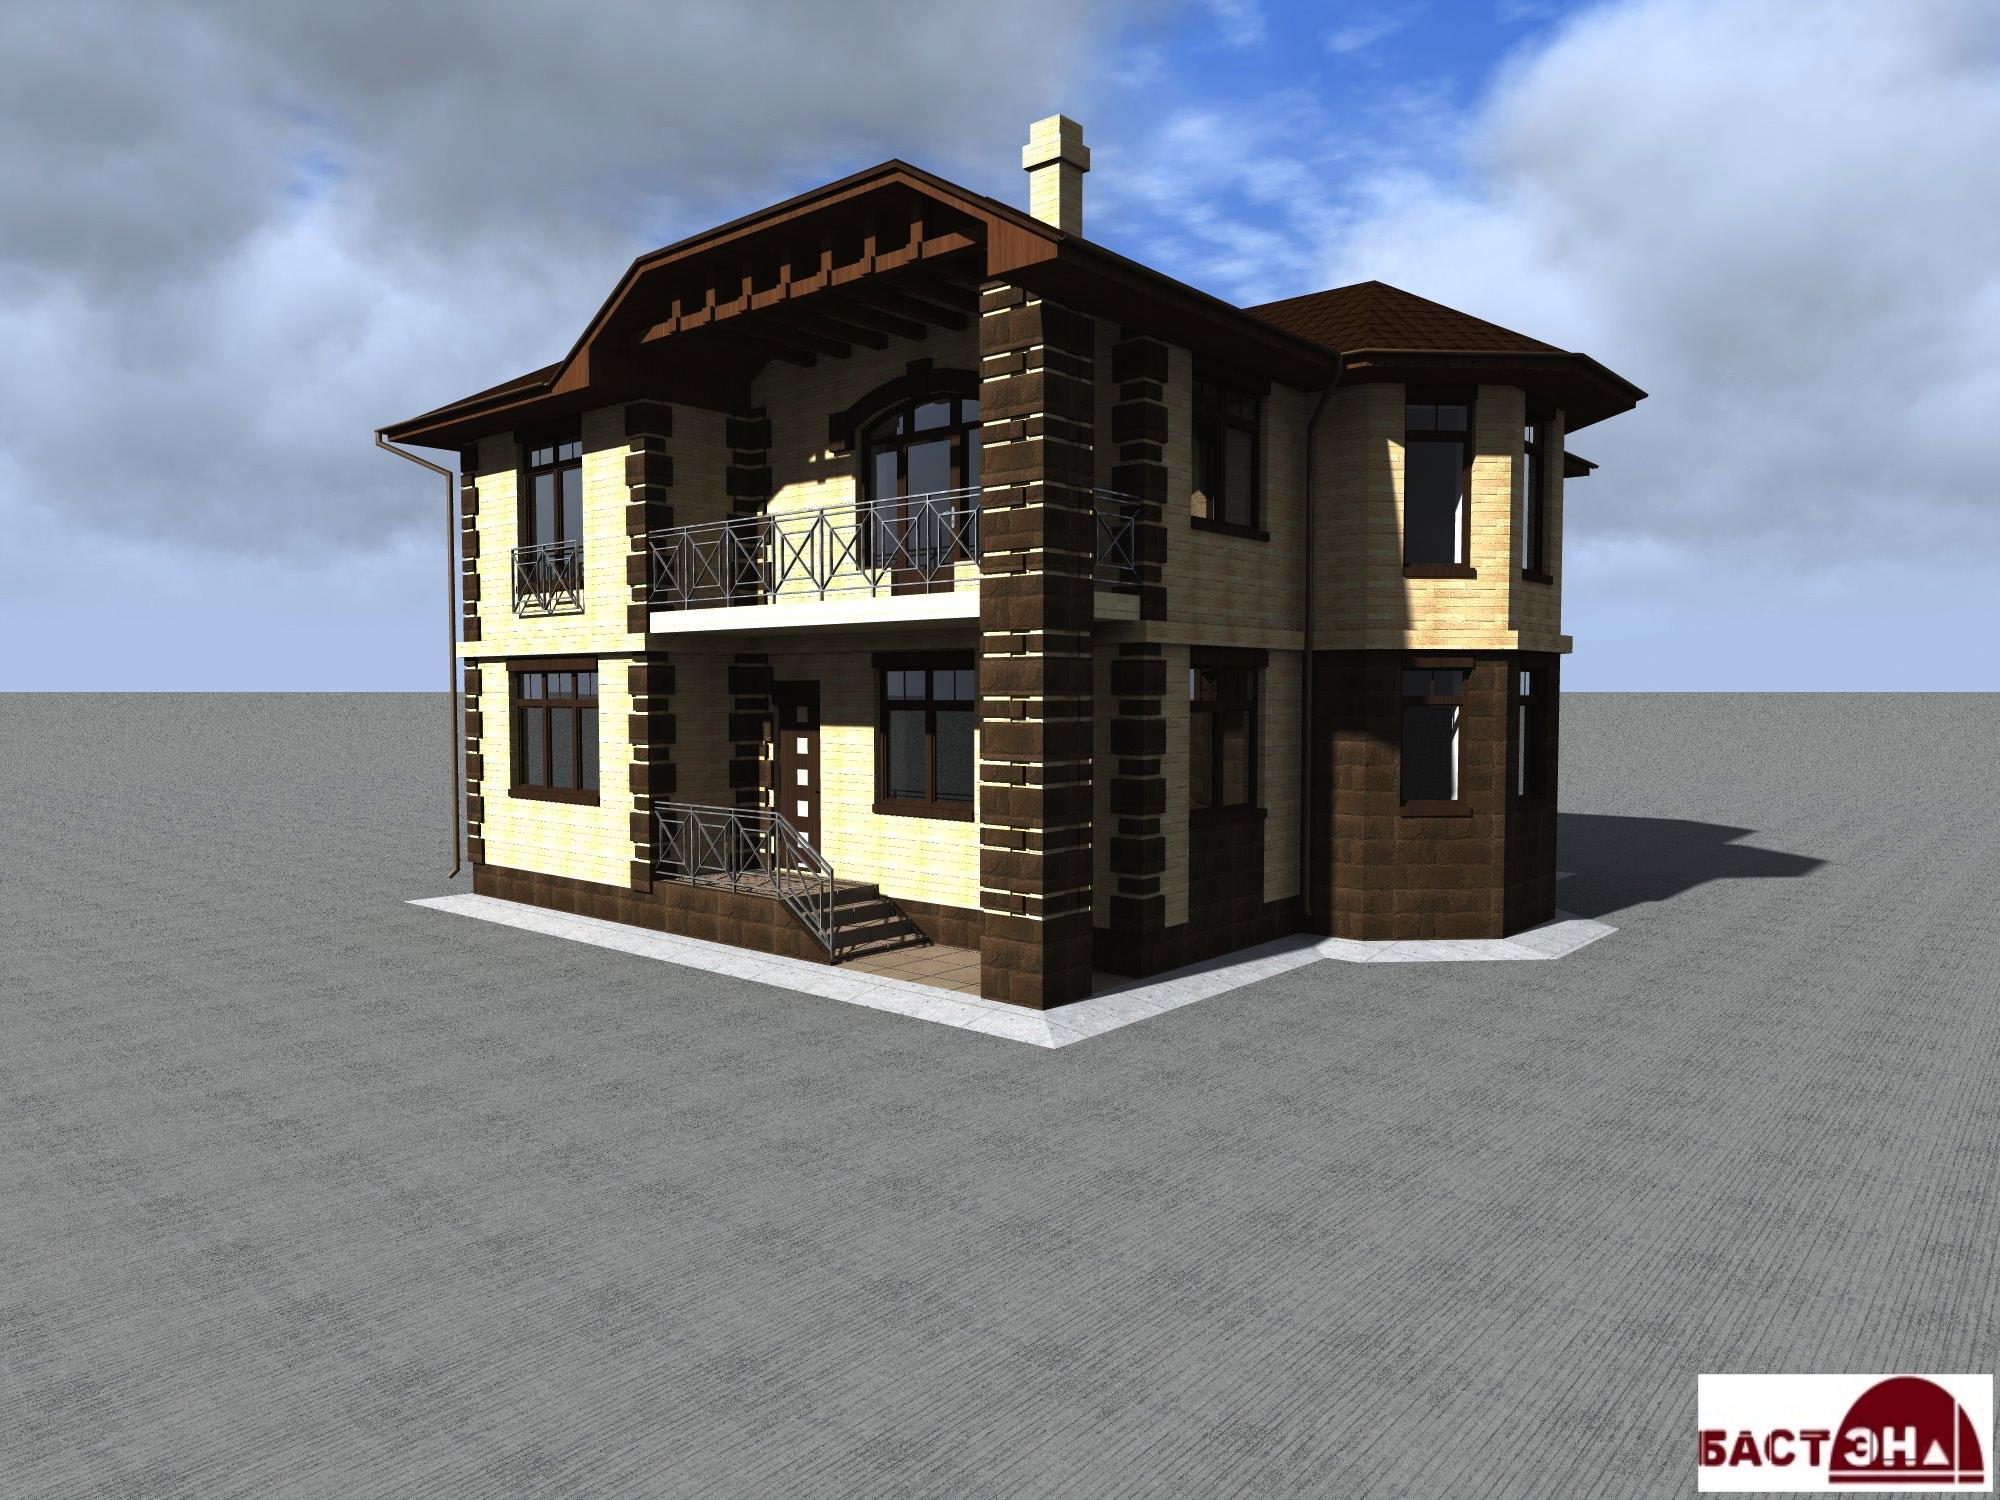 vid-individualnyj-dizajn-fasada-tipovogo-proekta-53-31.jpg